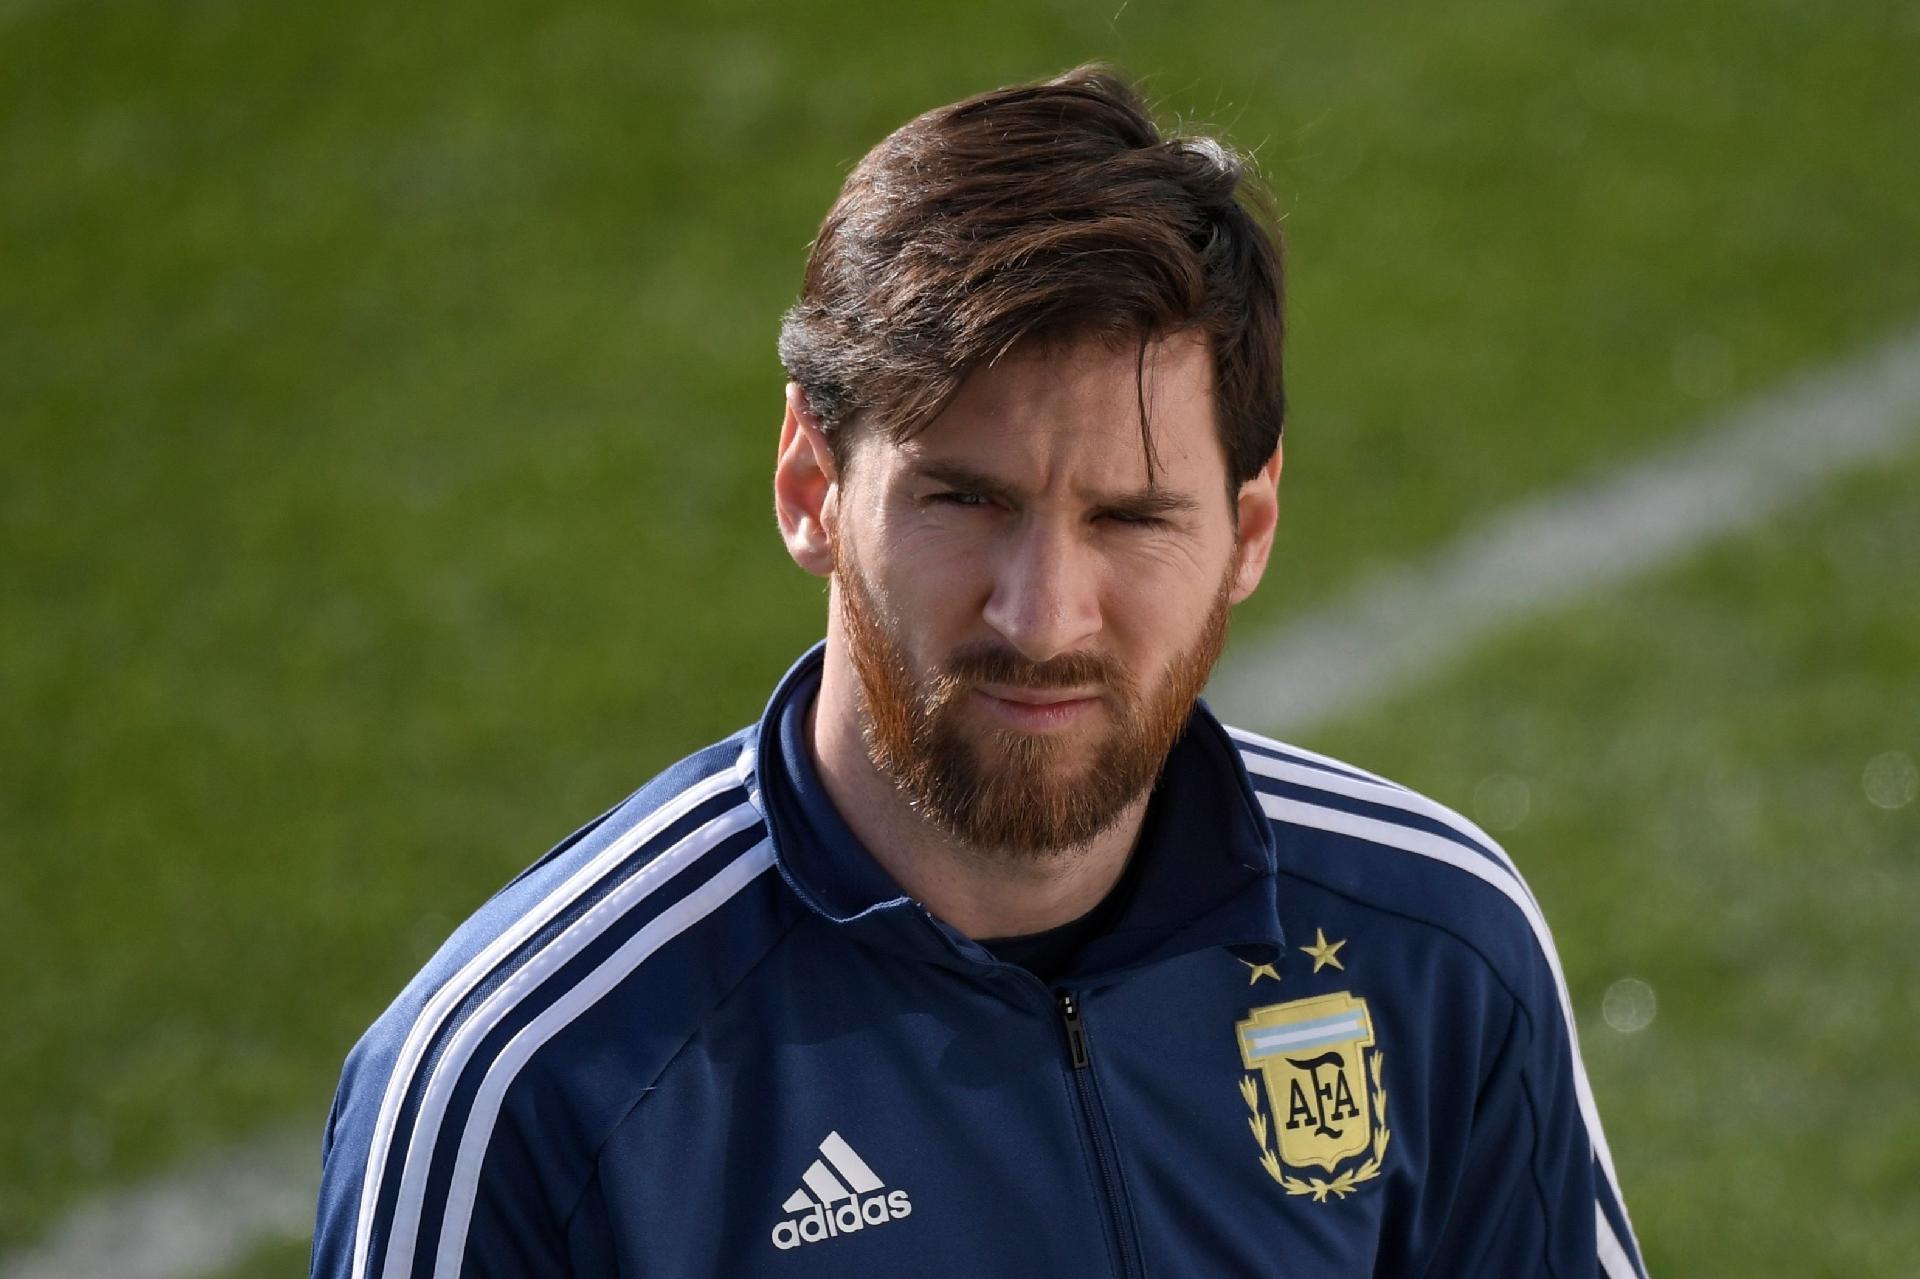 e4591b0788551 Copa do Mundo 2018  Messi encara Copa da Rússia como chance final de  título   É agora ou nunca  - UOL Copa do Mundo 2018